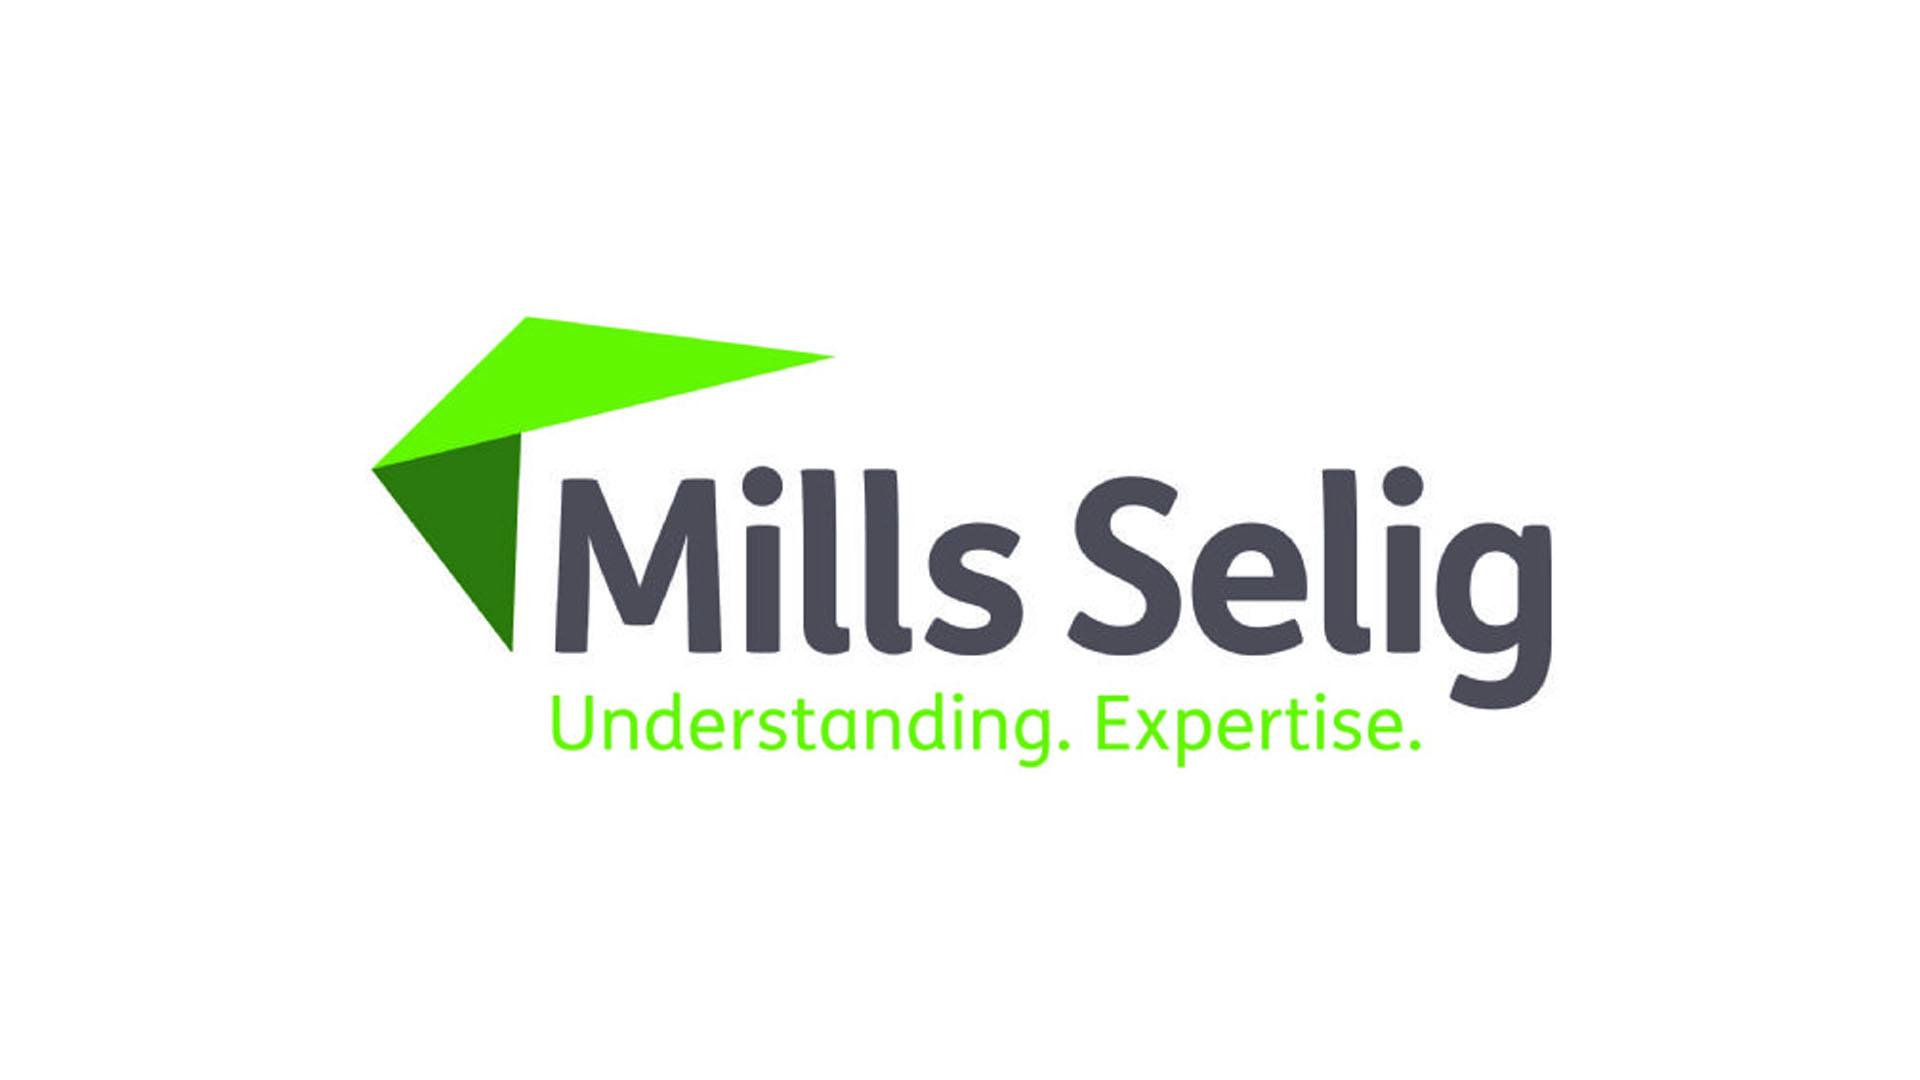 Mills Selig